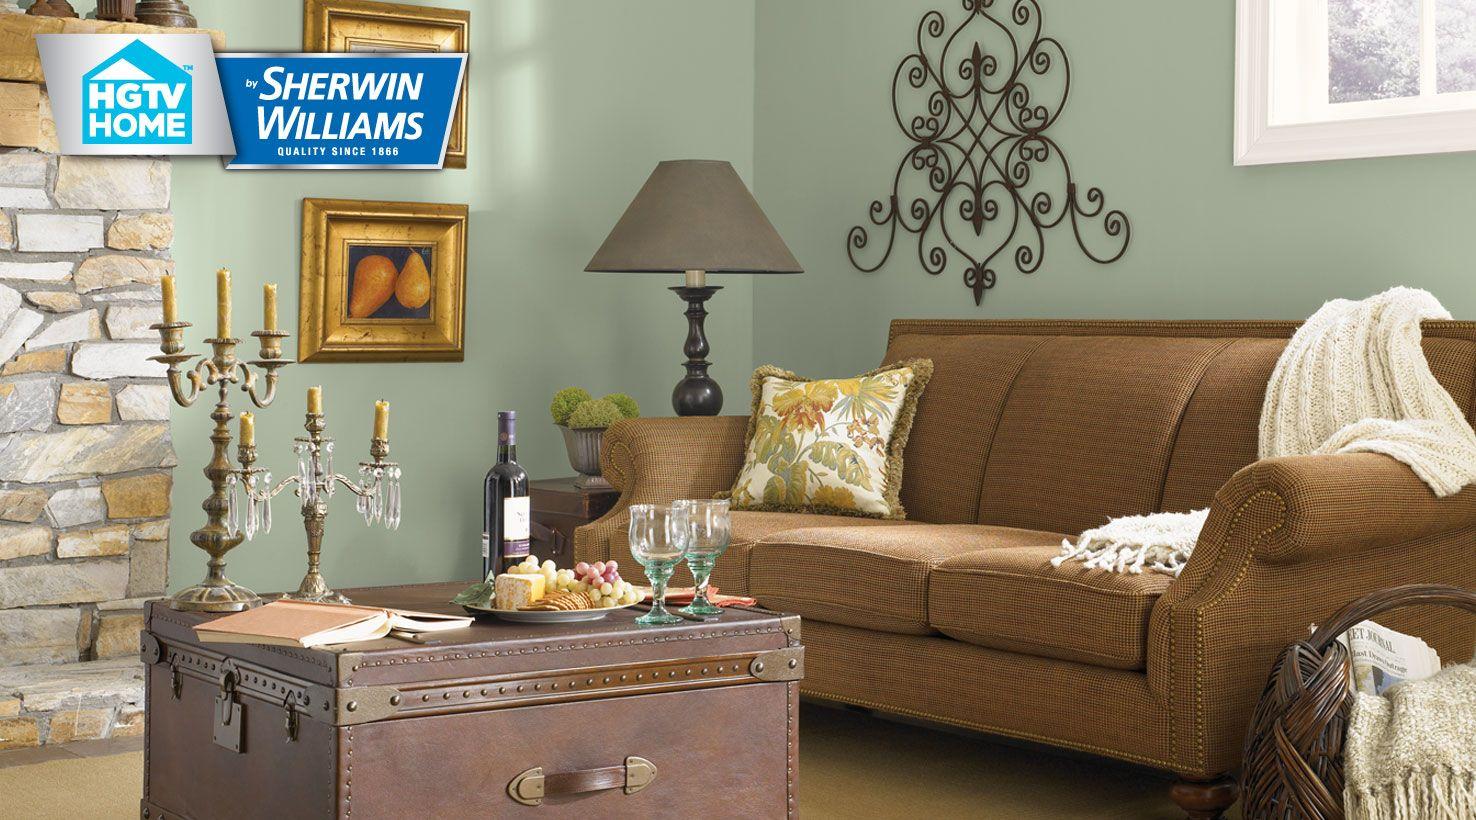 Sherwin Williams Rustic Refined Pallette. Especially Cascade Green, Copen  Blue, Creamy, Muslin